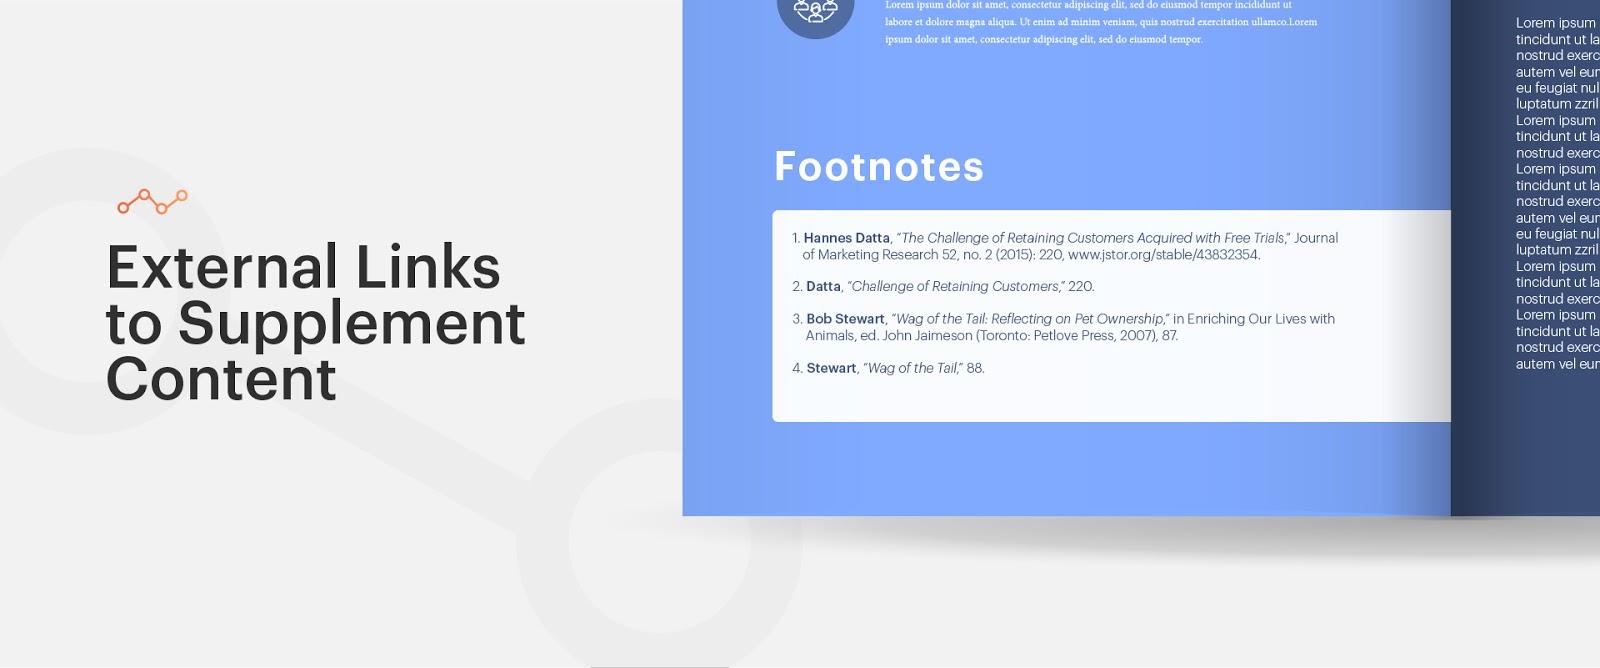 External Links to Supplement Content